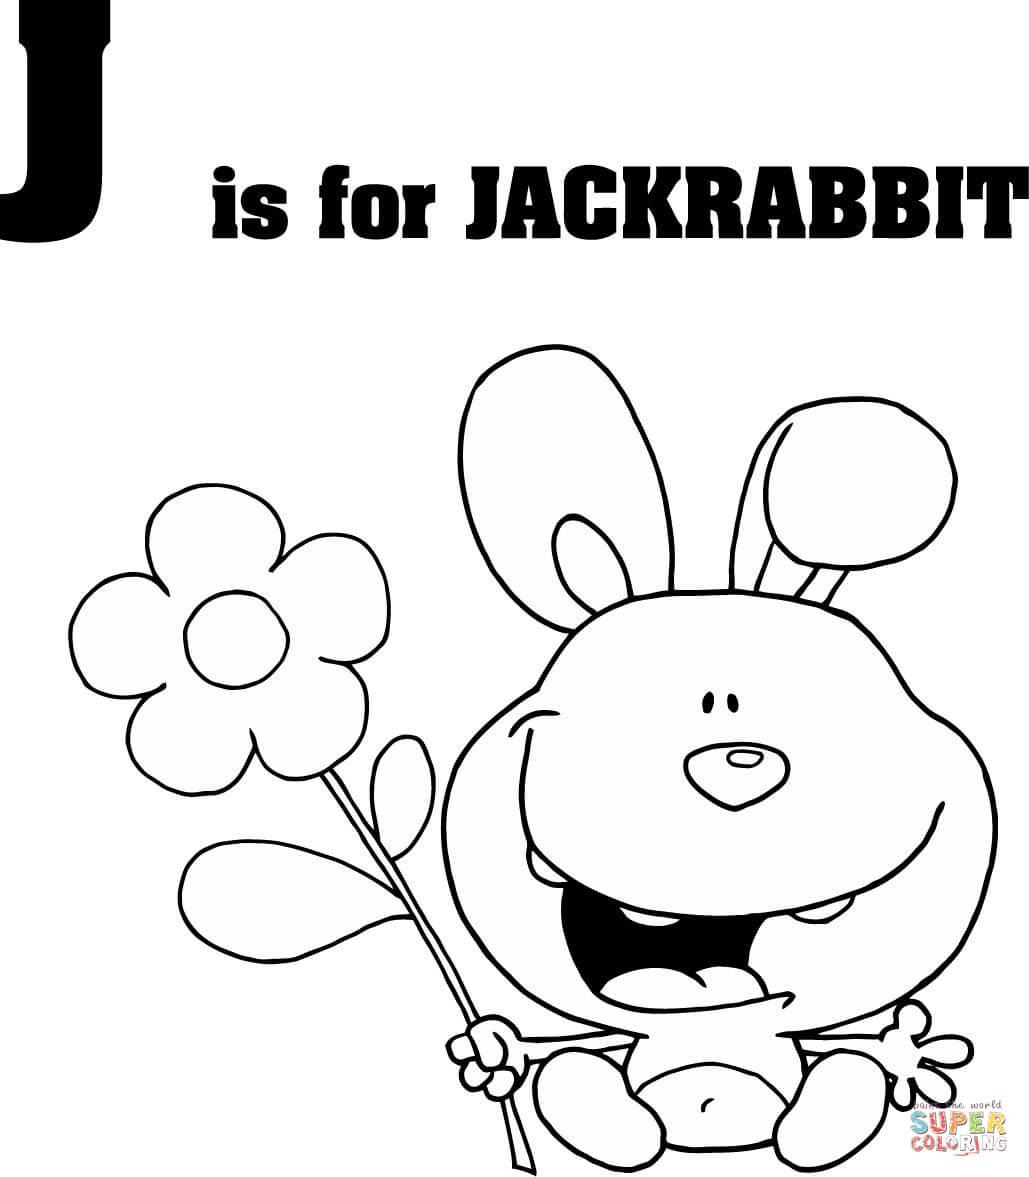 Letter J Is For Jackrabbit Coloring Page